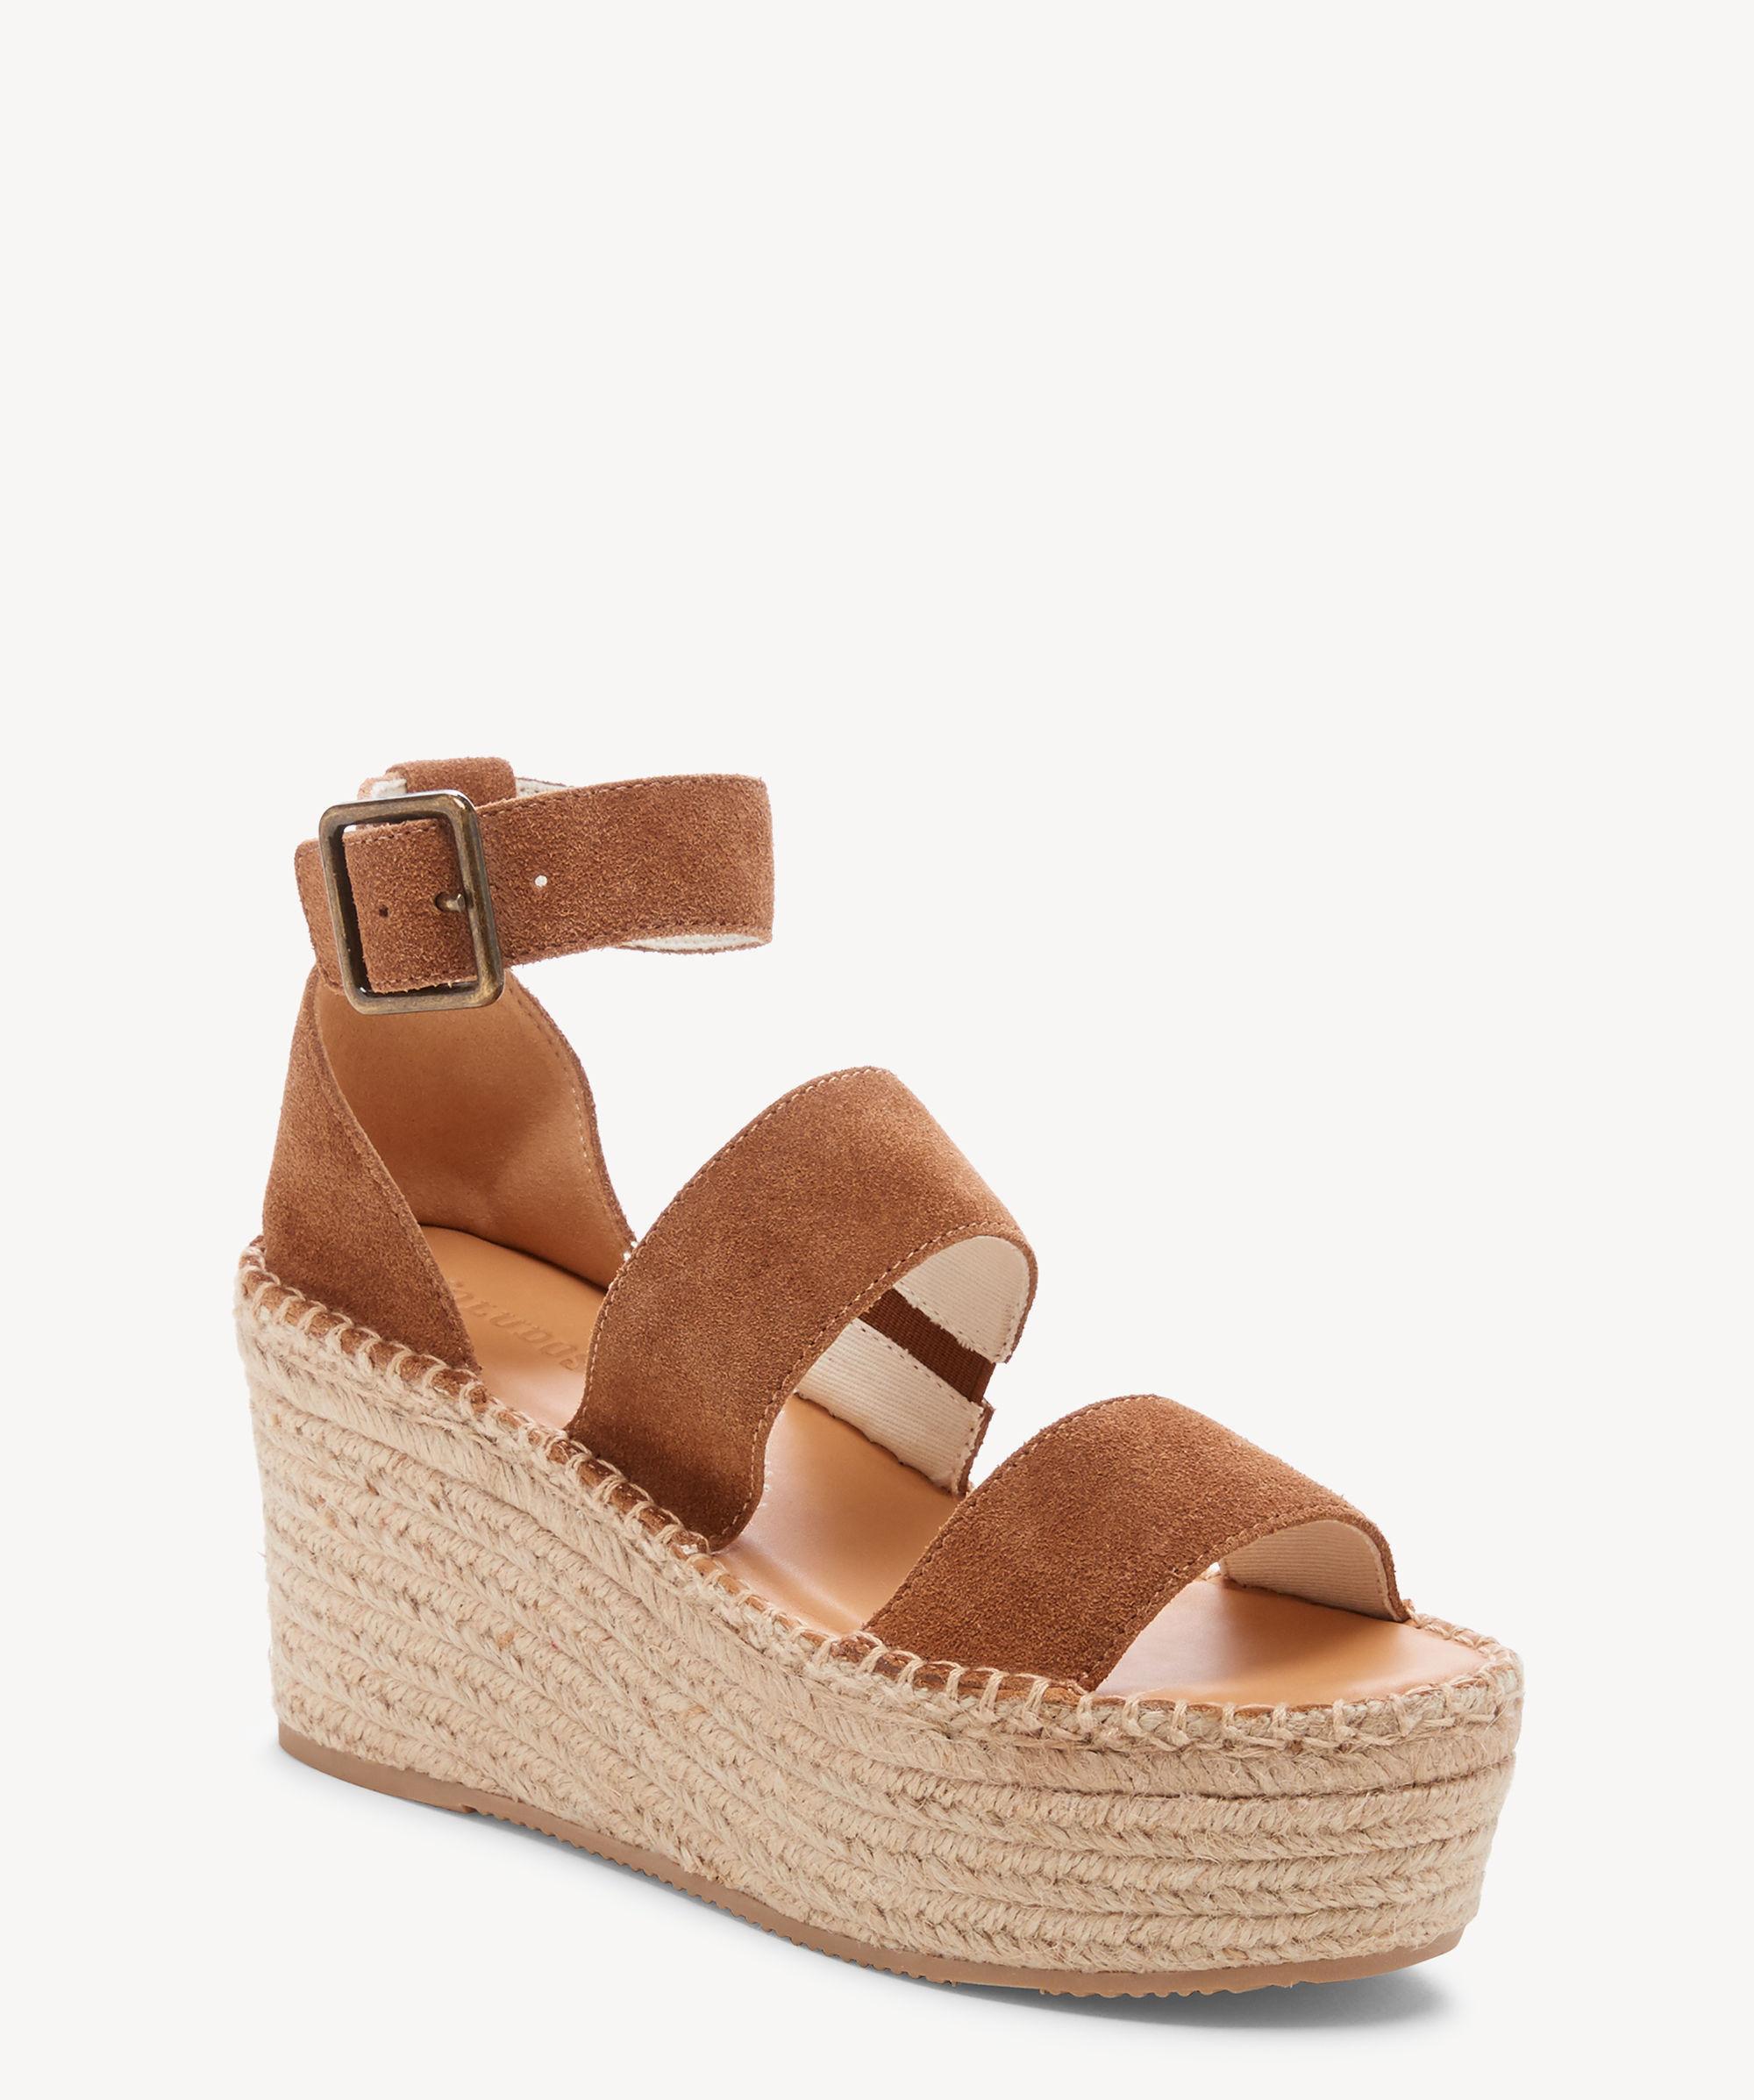 e10cf87502d Lyst - Soludos Palma Platform Sandal Platform Sandal in Brown - Save 30%